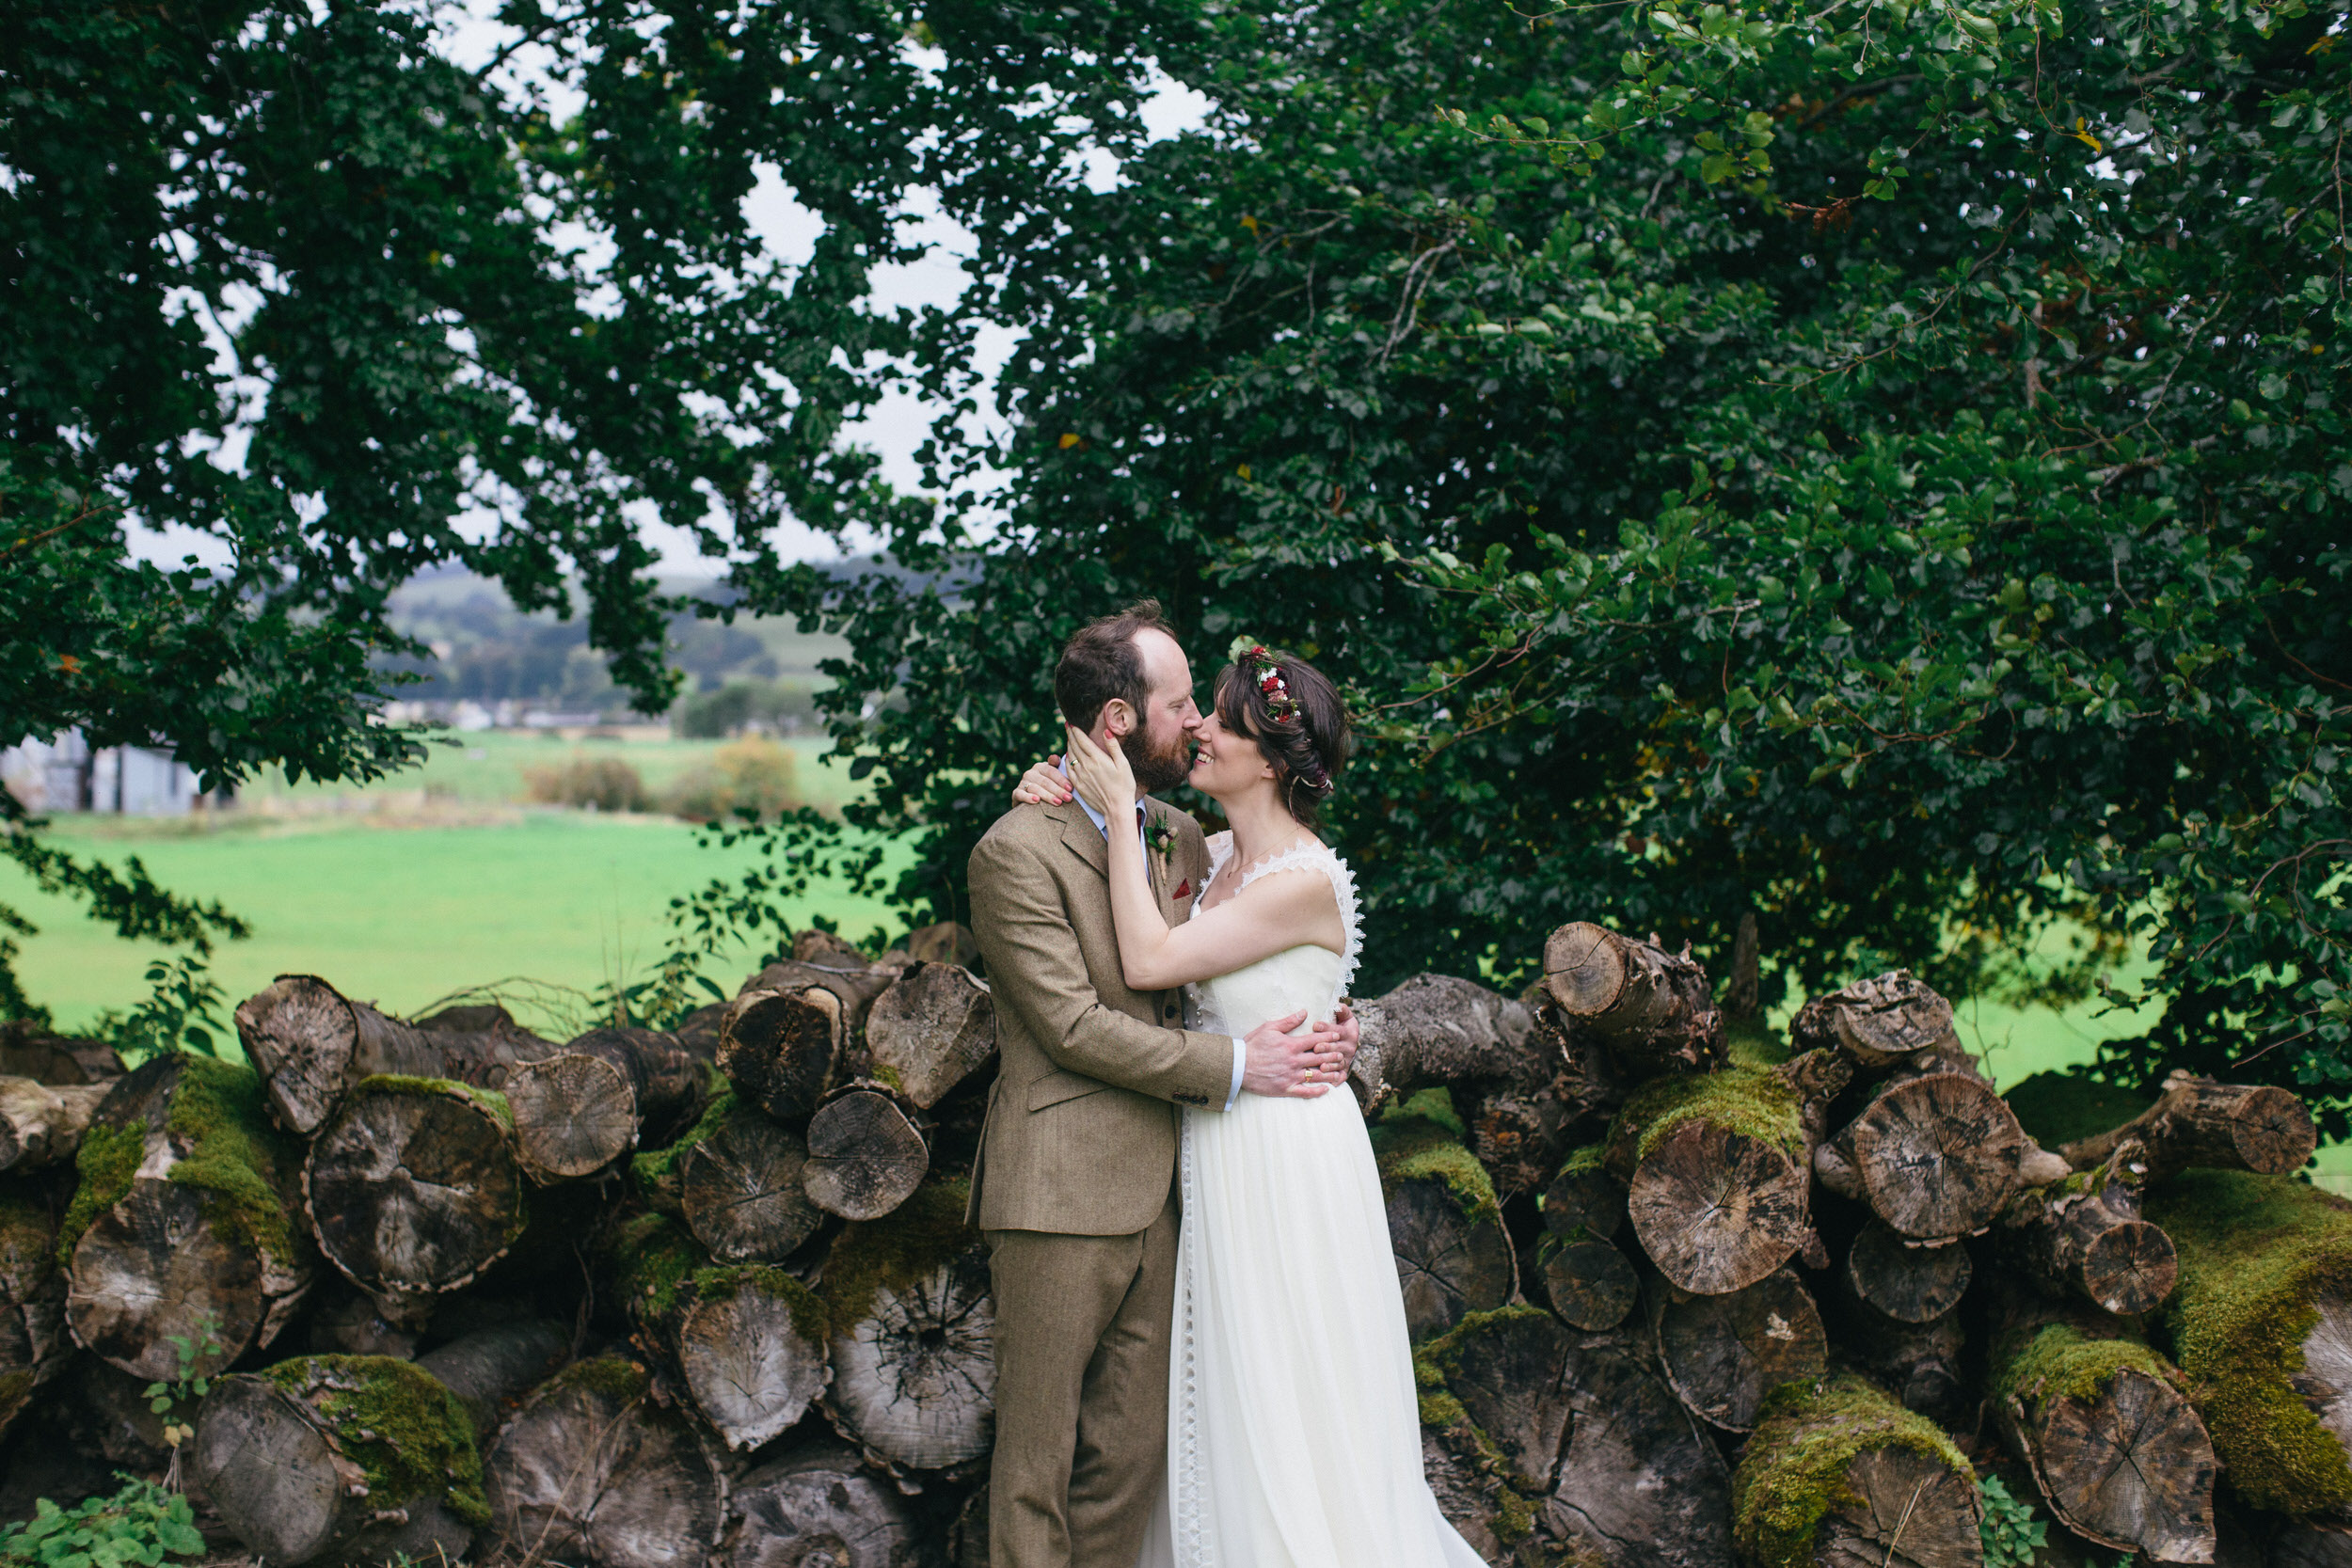 Quirky Wedding Photography Scotland Borders Biggar Hartree 066.jpg